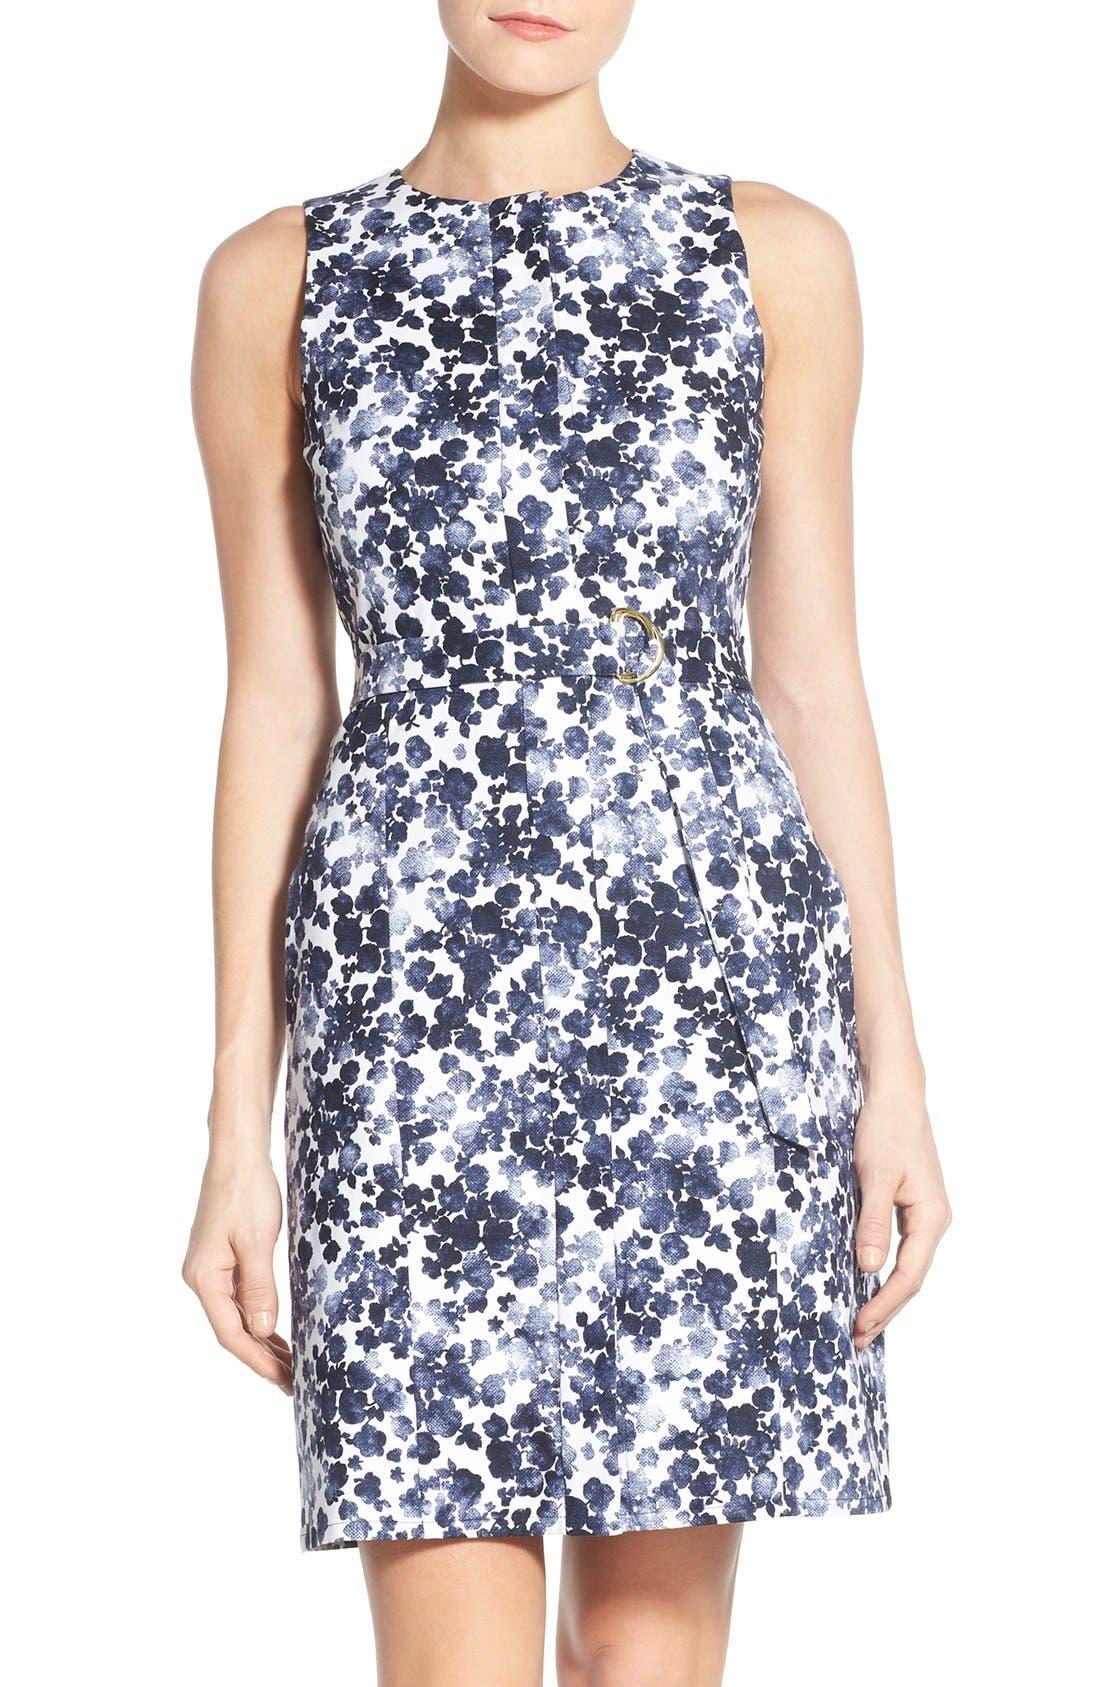 Alternate Image 1 Selected - MICHAEL Michael Kors 'Gemma' Print Belted A-Line Dress